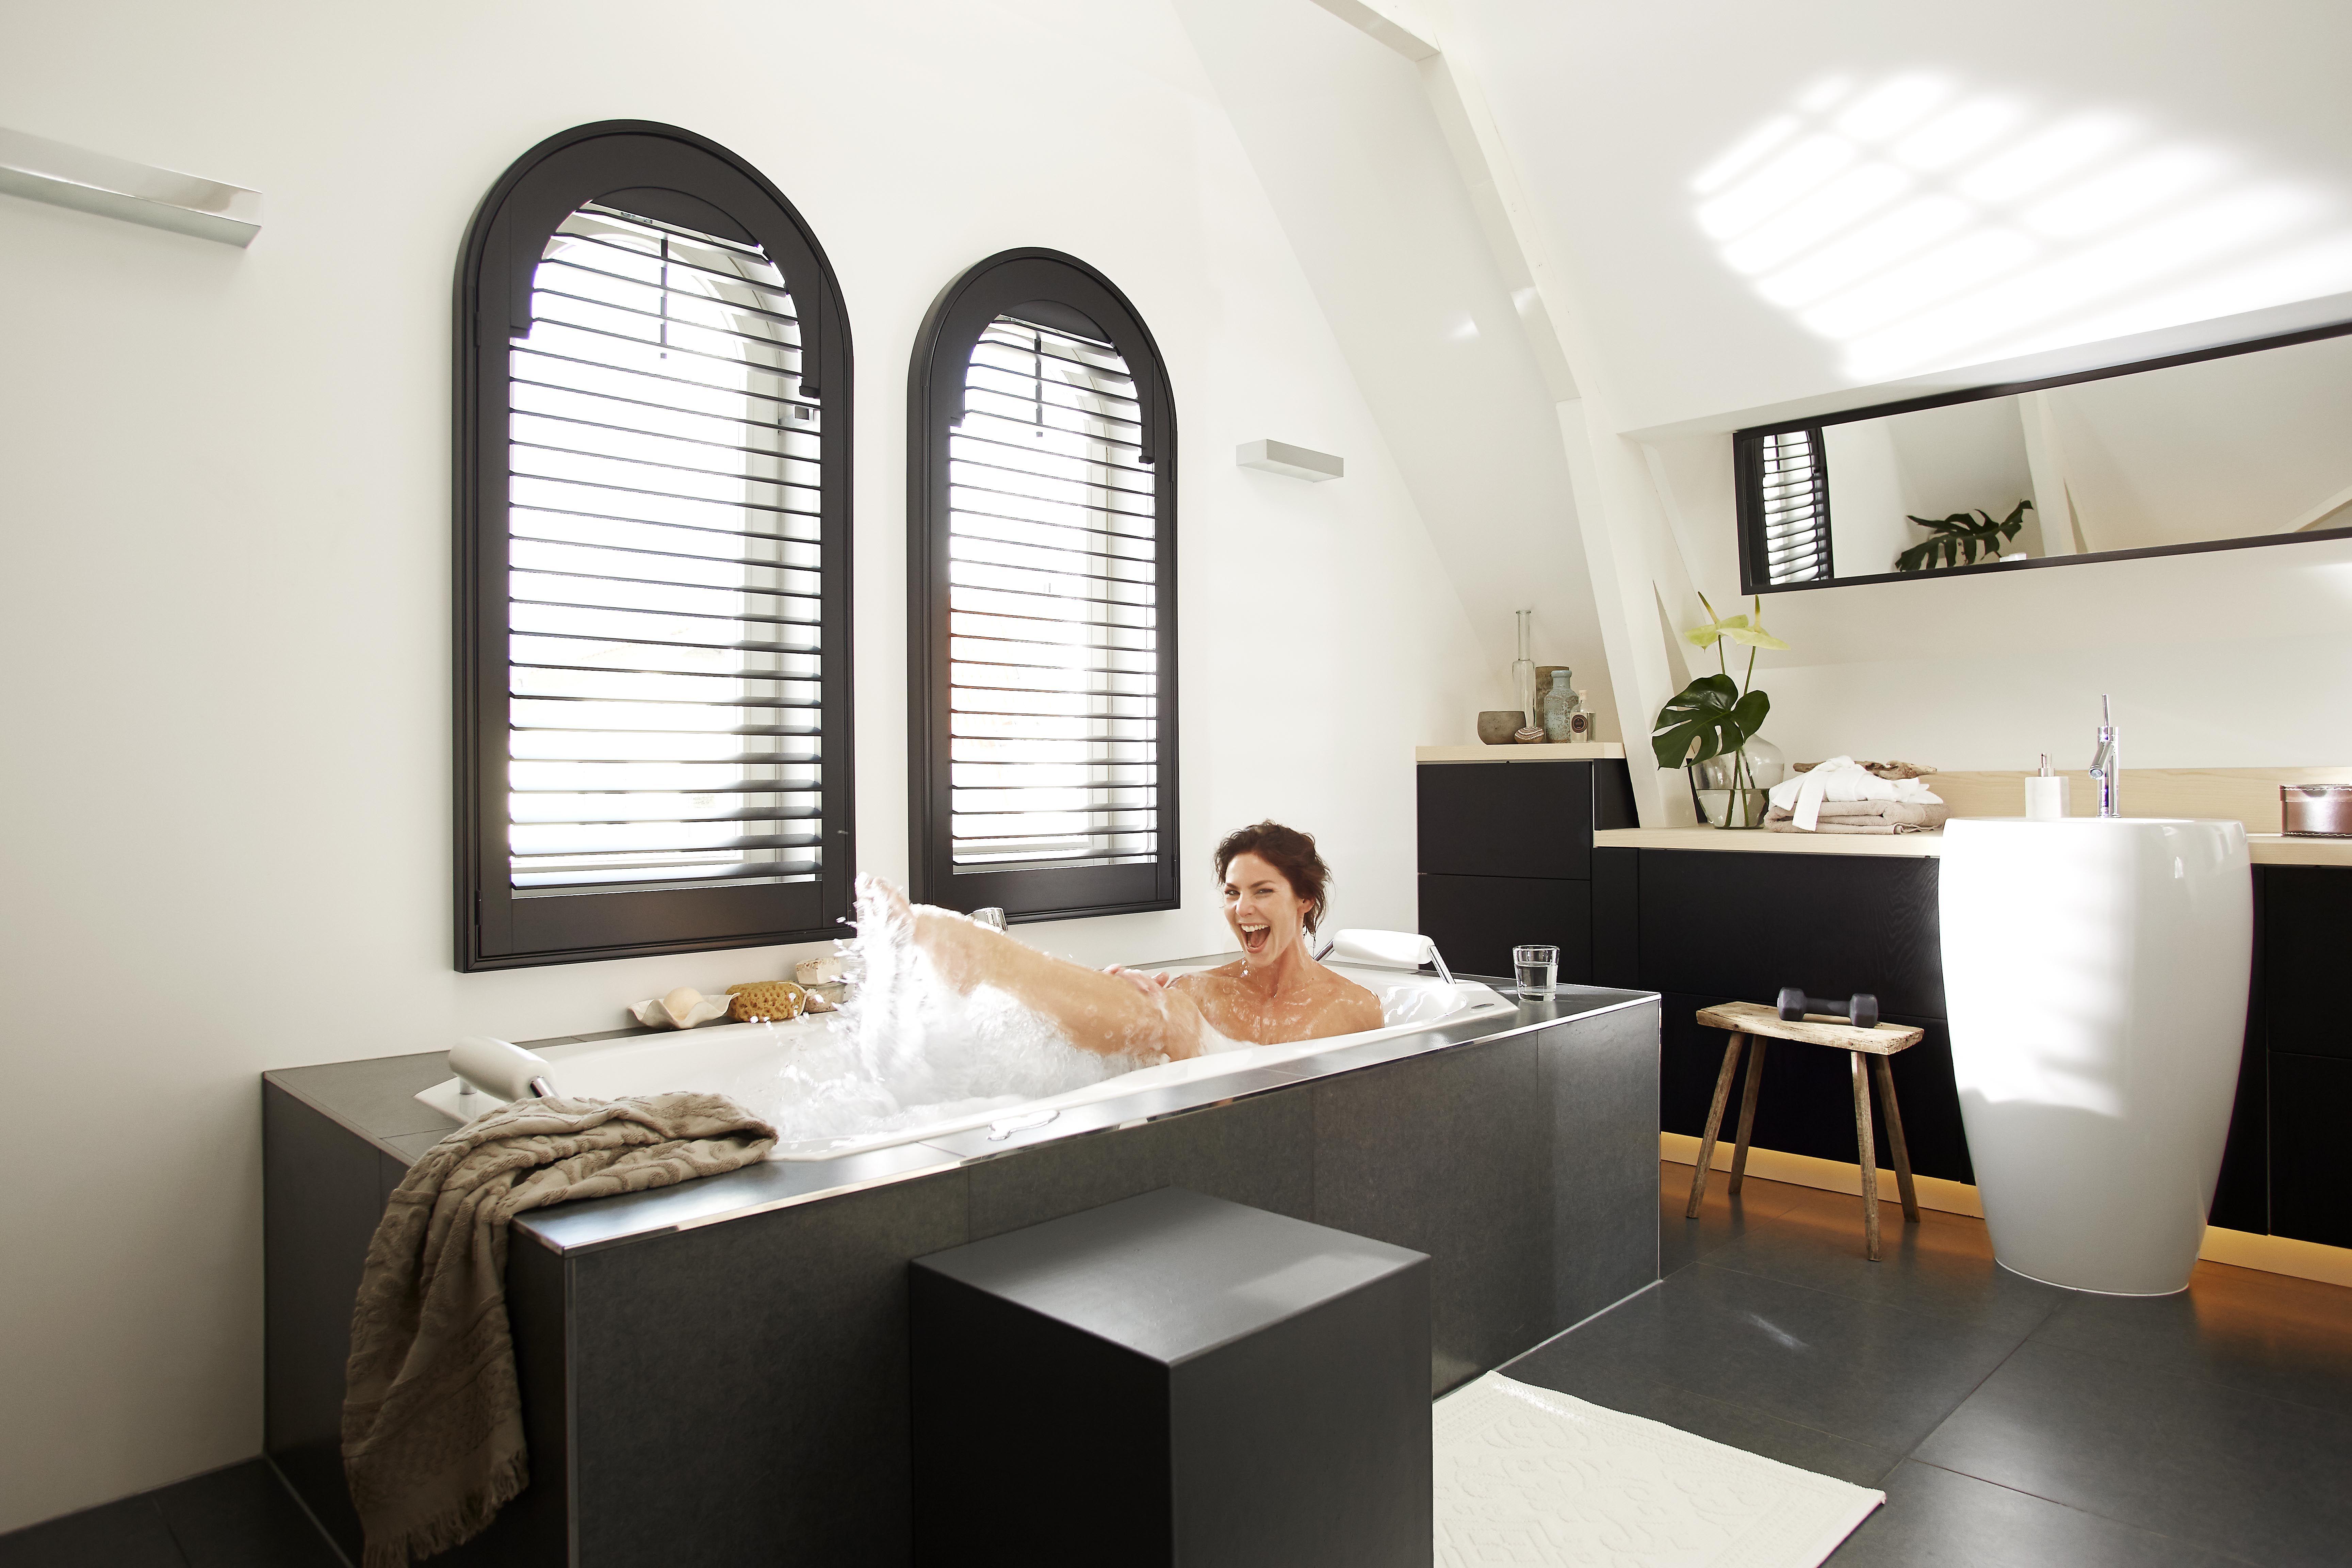 Cleopatra ligbad badkamer sanidrome | 1. Ligbad | Pinterest